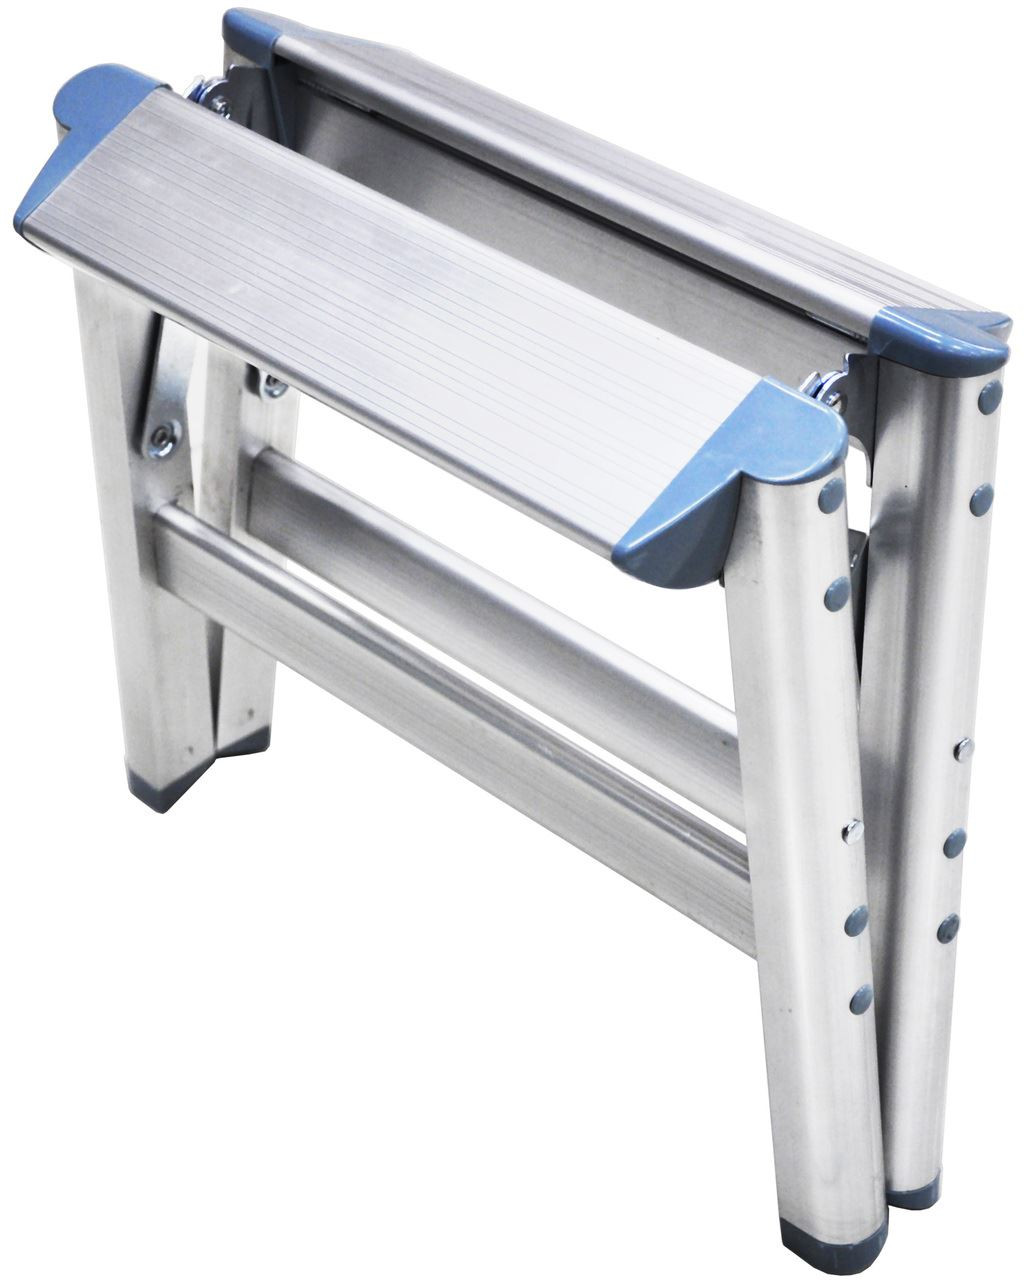 Telesteps 100ss 12 Quot Aluminum Folding Step Stool